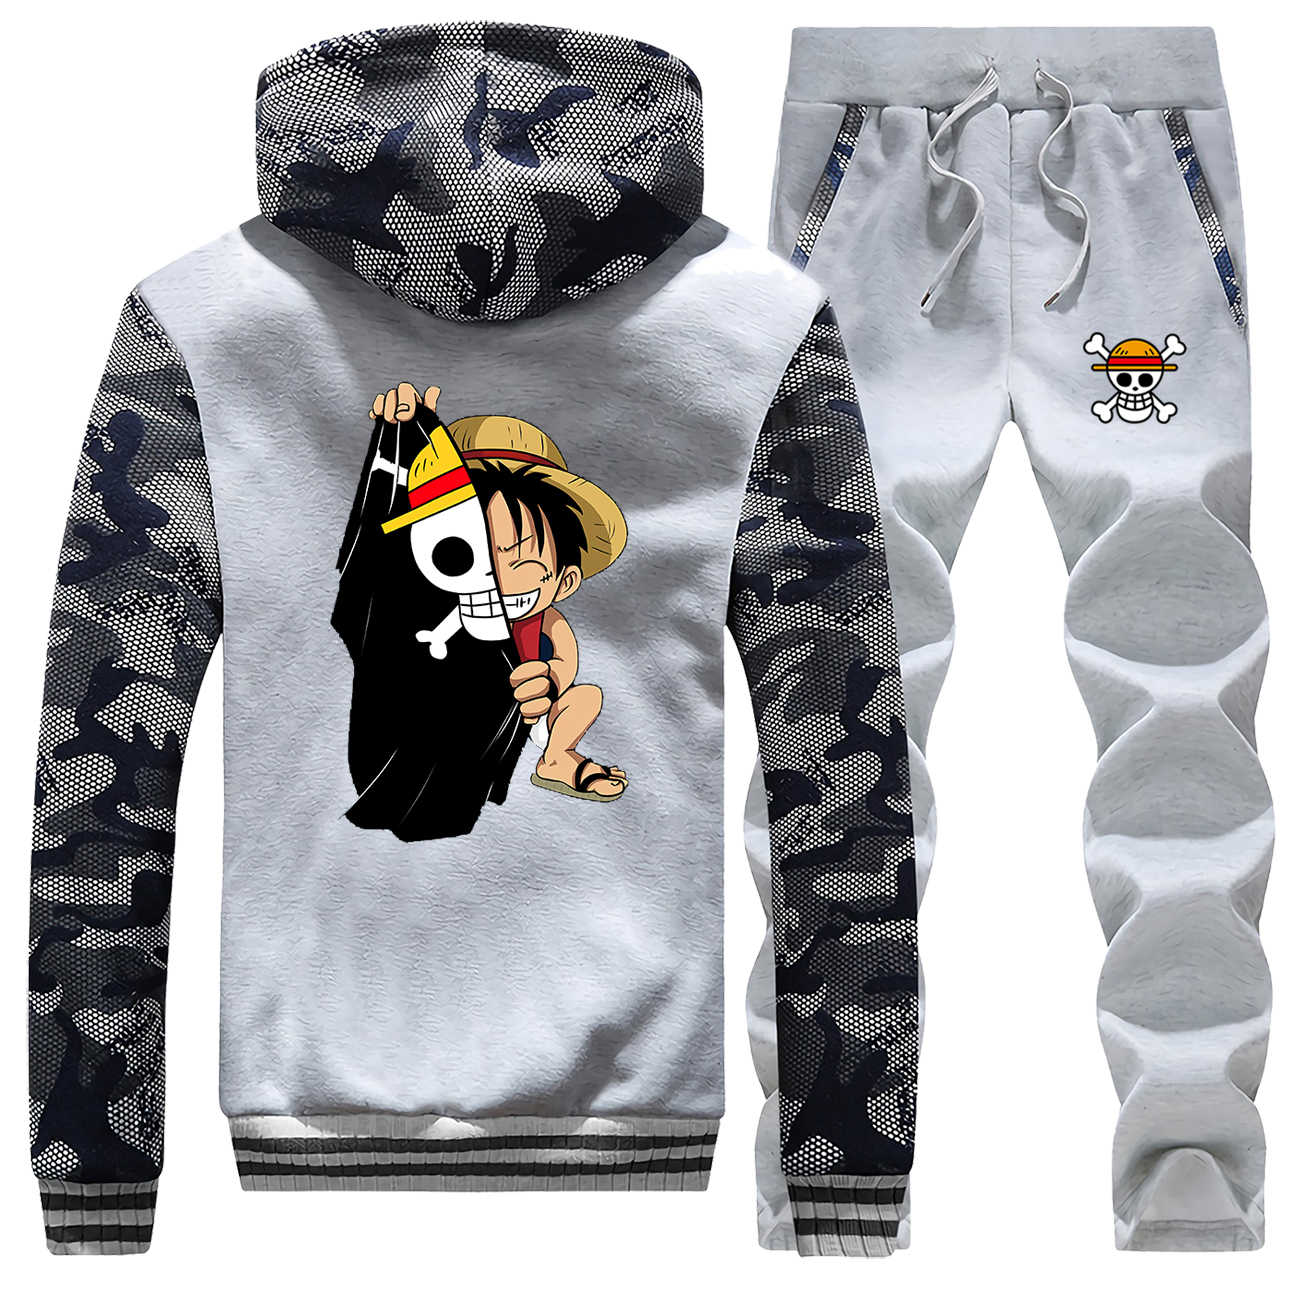 Japanischen Anime männer Voller Anzug Trainingsanzug Ein Stück Sweatsuit Luffy Druck Camo Hoodies Fleece Harajuku Outwear Winter Warme Jacke